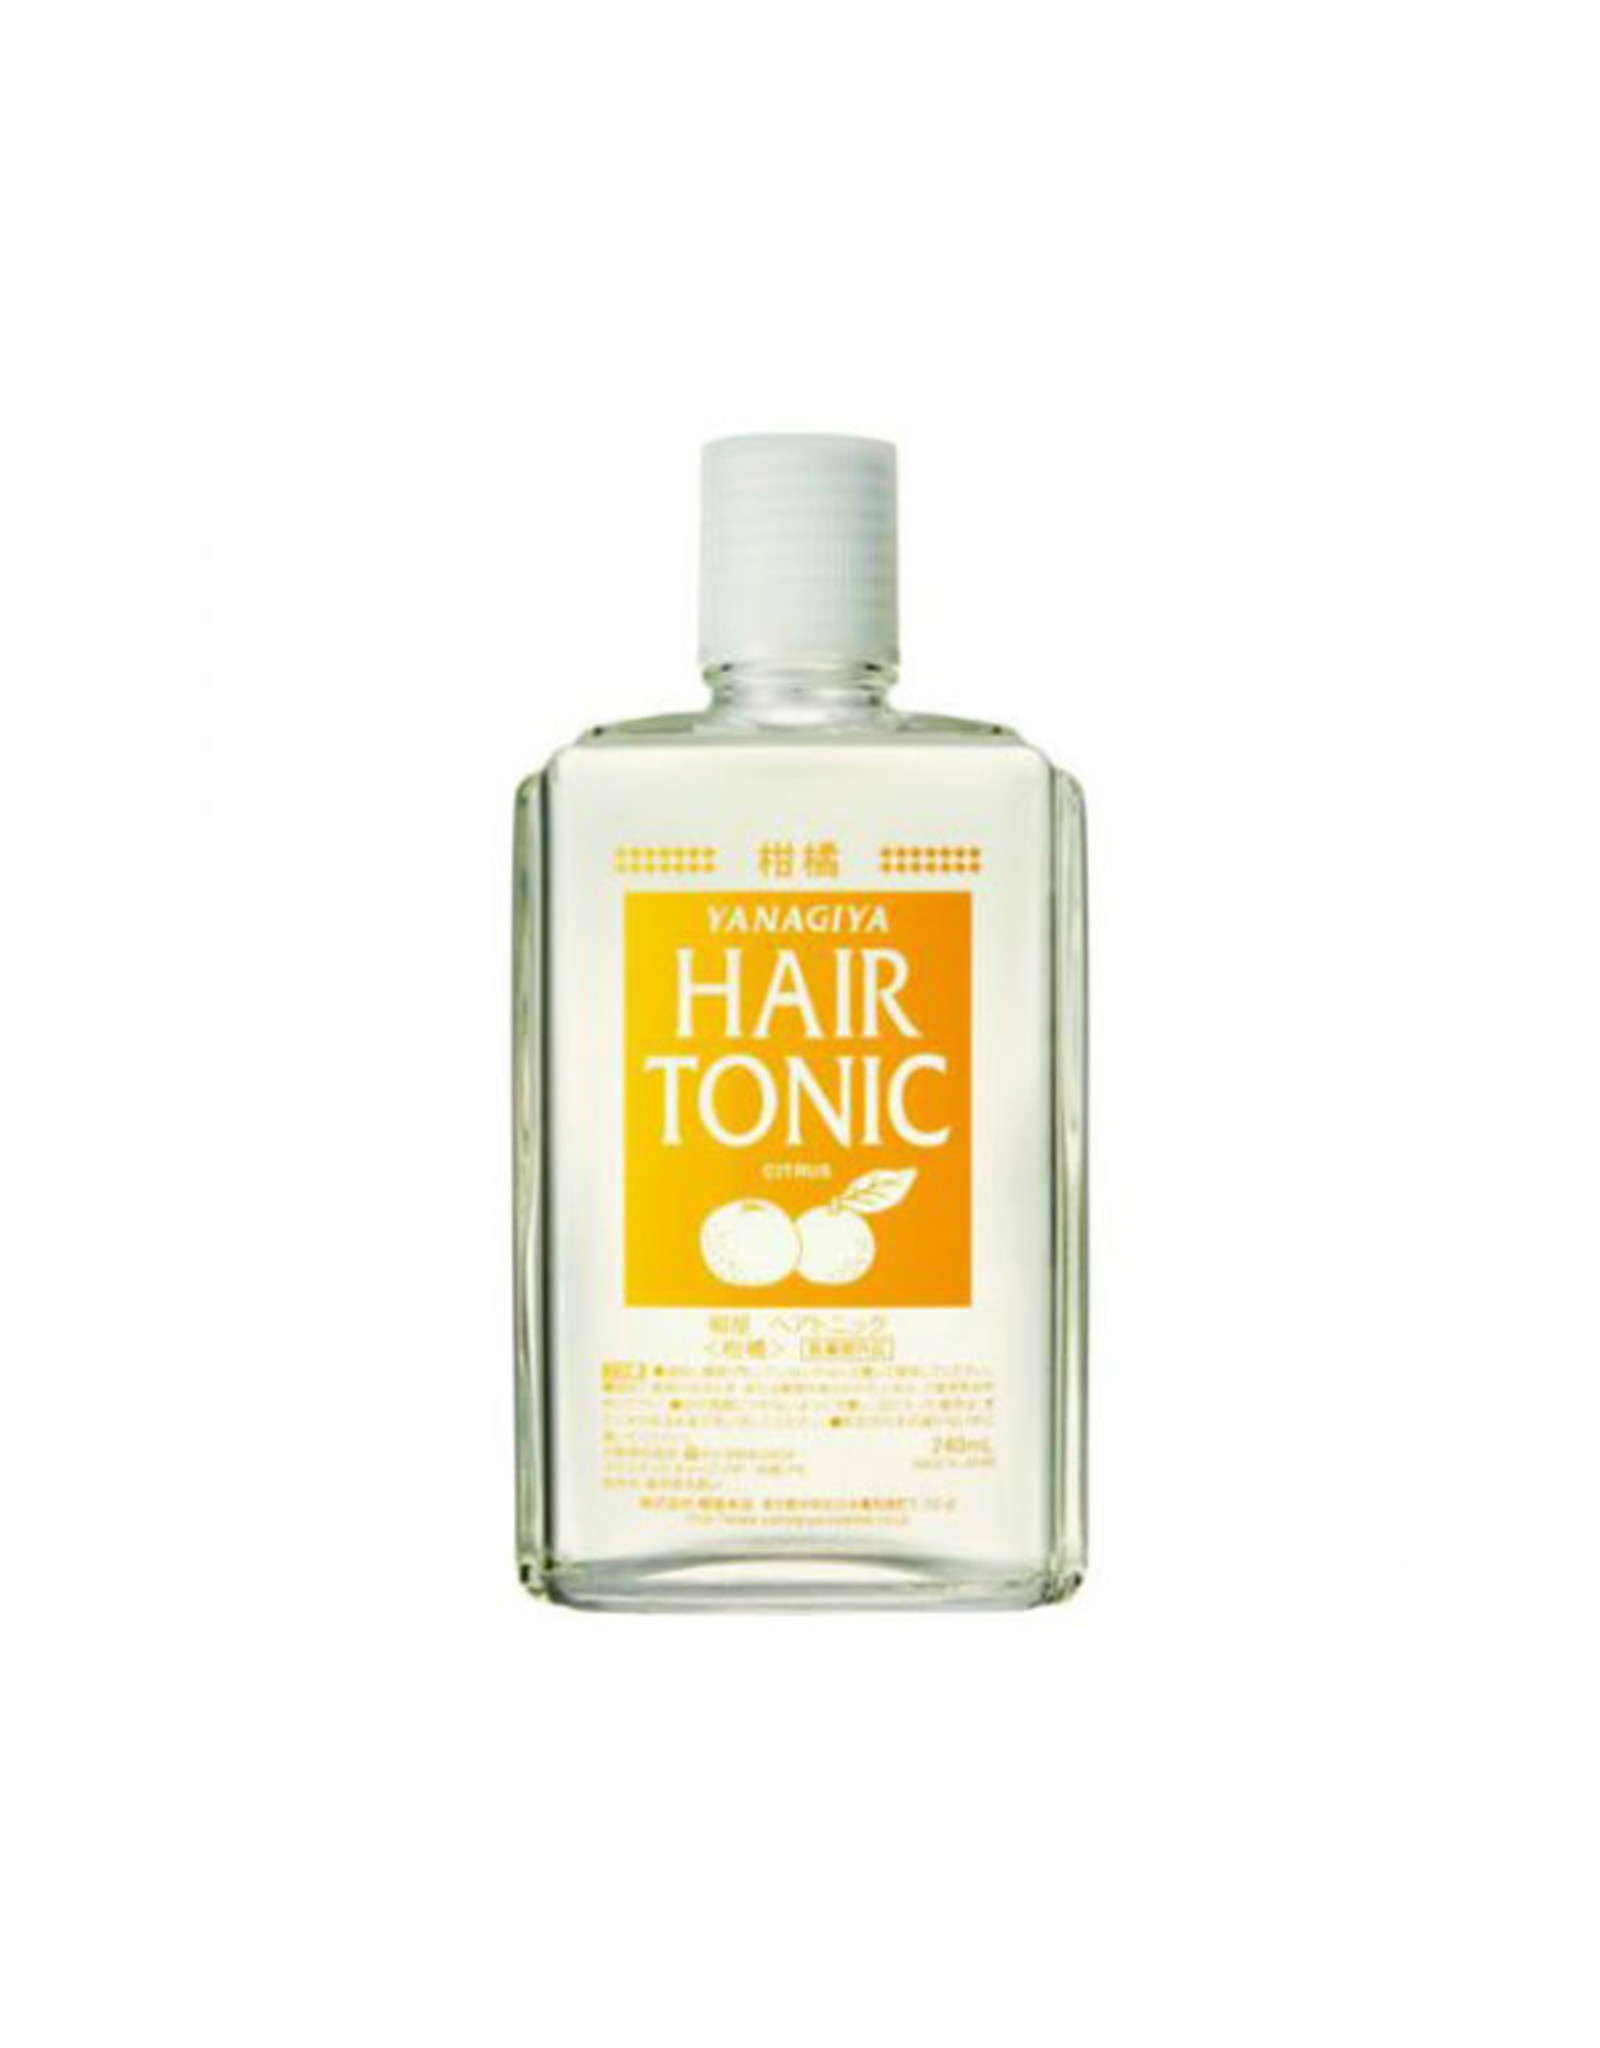 Yanagiya Yanagiya Hair Tonic 240ml